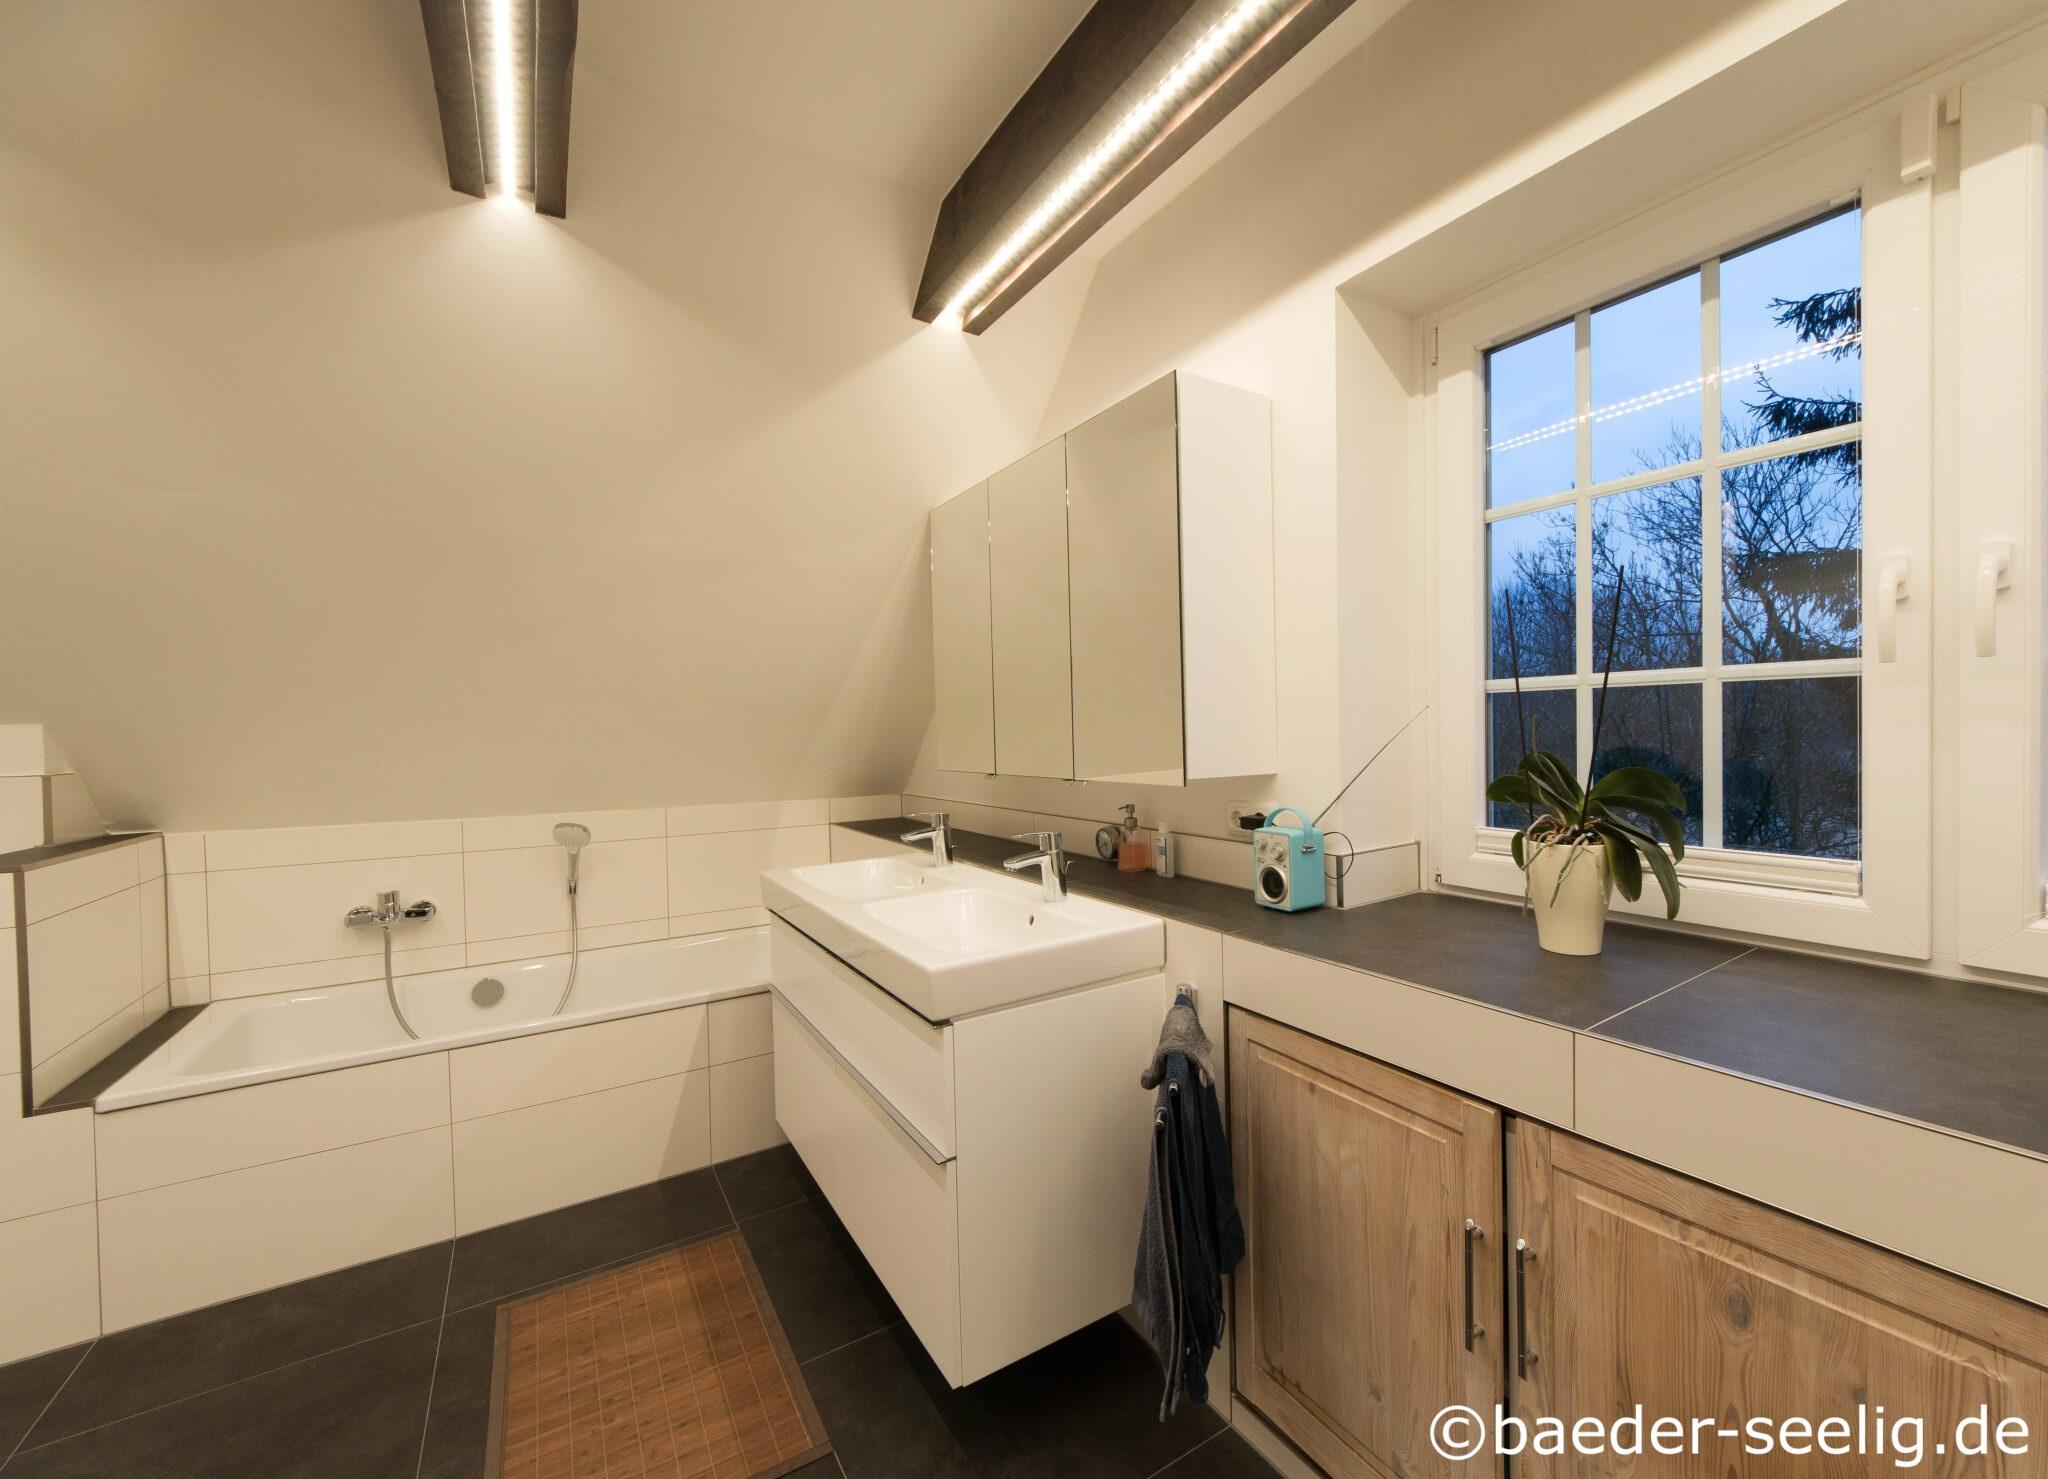 20 qm Dachgeschoss Badezimmer   Beispiele und Ideen   BÄDER SEELIG